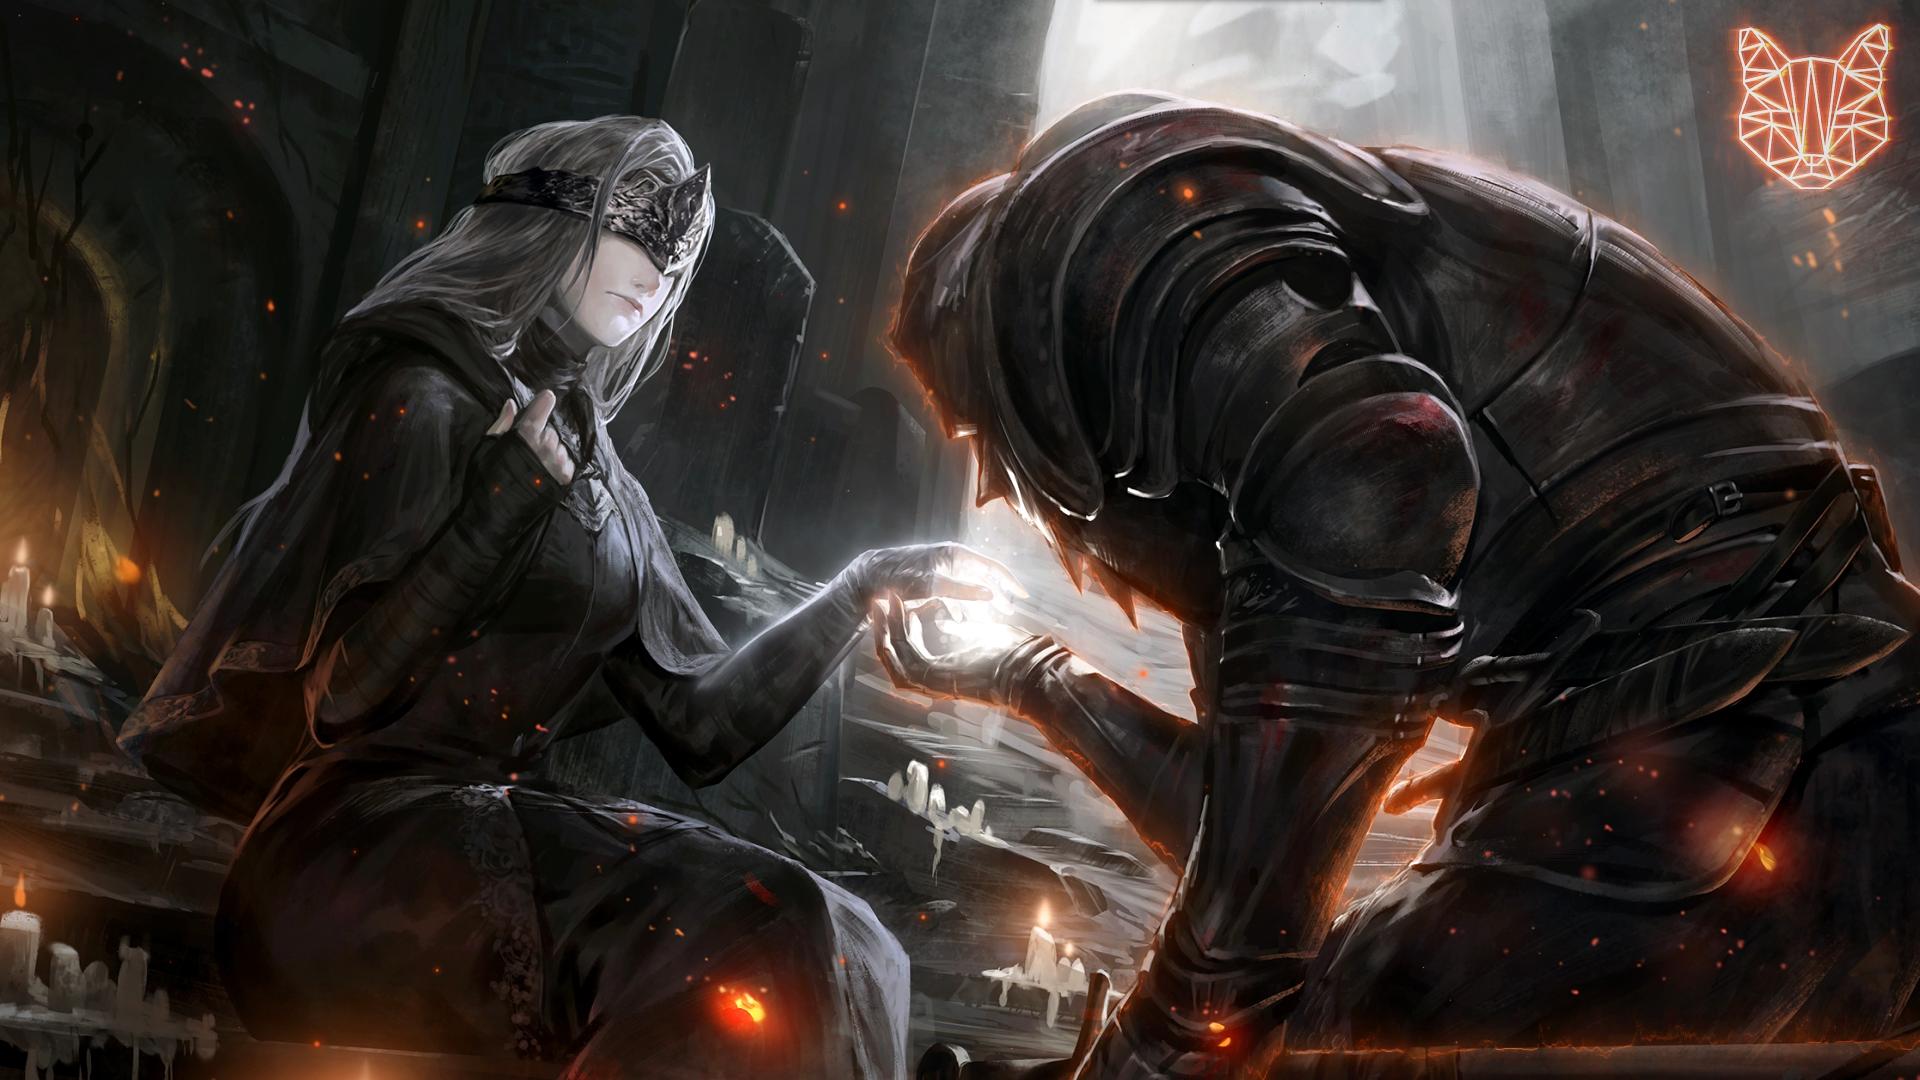 General 1920x1080 Dark Souls video game art video game characters dark souls 3 Dark Souls III